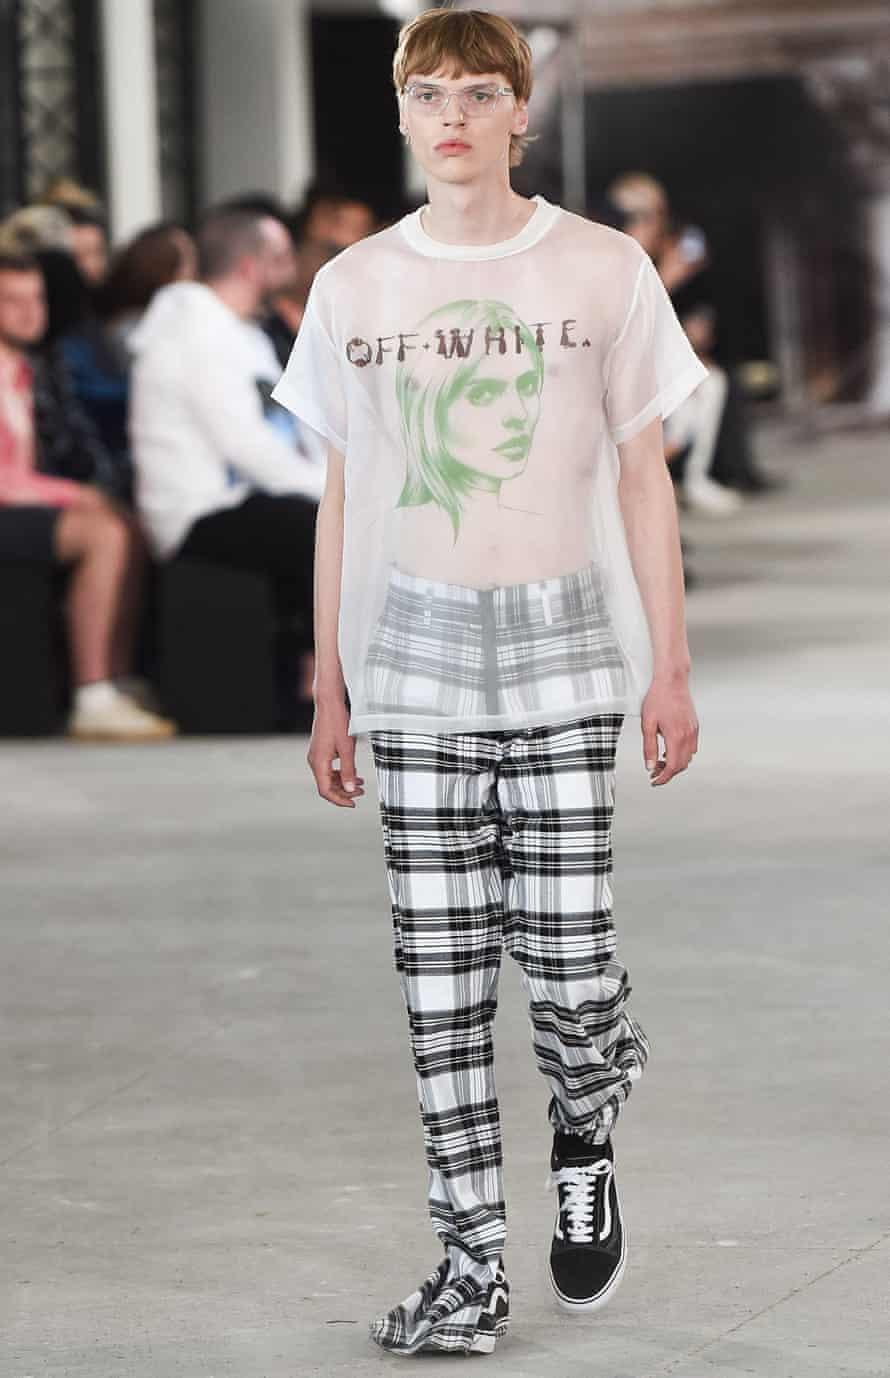 The Off-White show at Paris Men's Fashion Week.